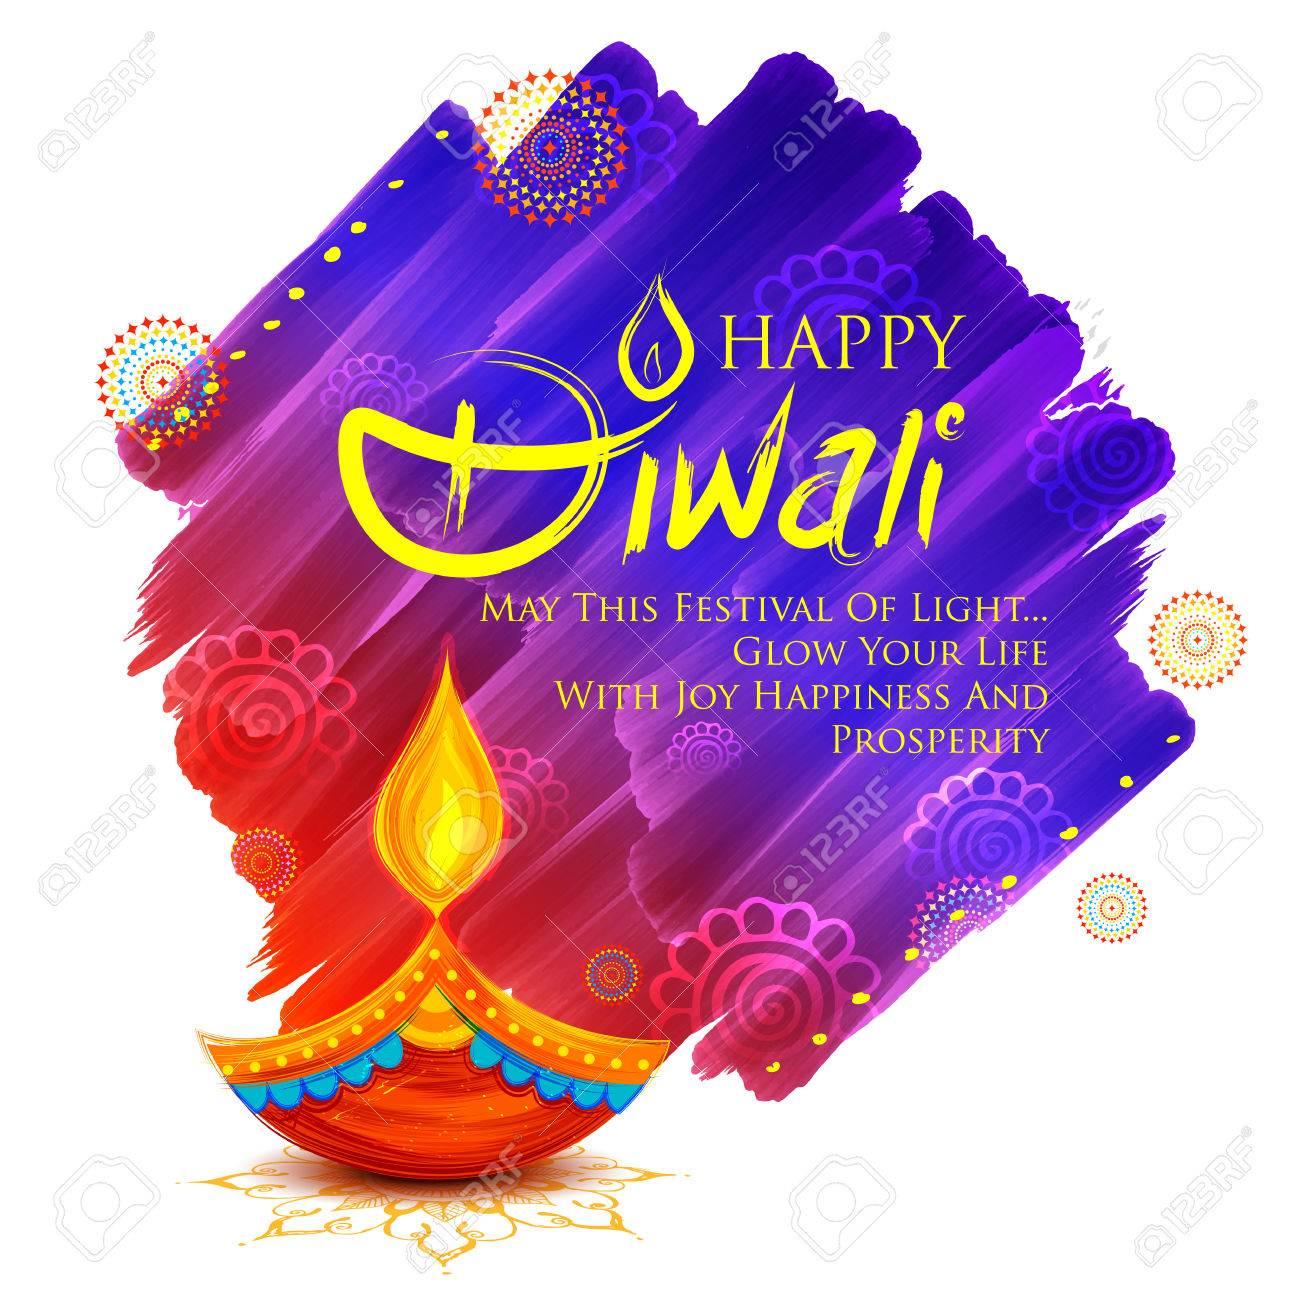 illustration of burning diya on Happy Diwali Holiday background for light festival of India - 86925967